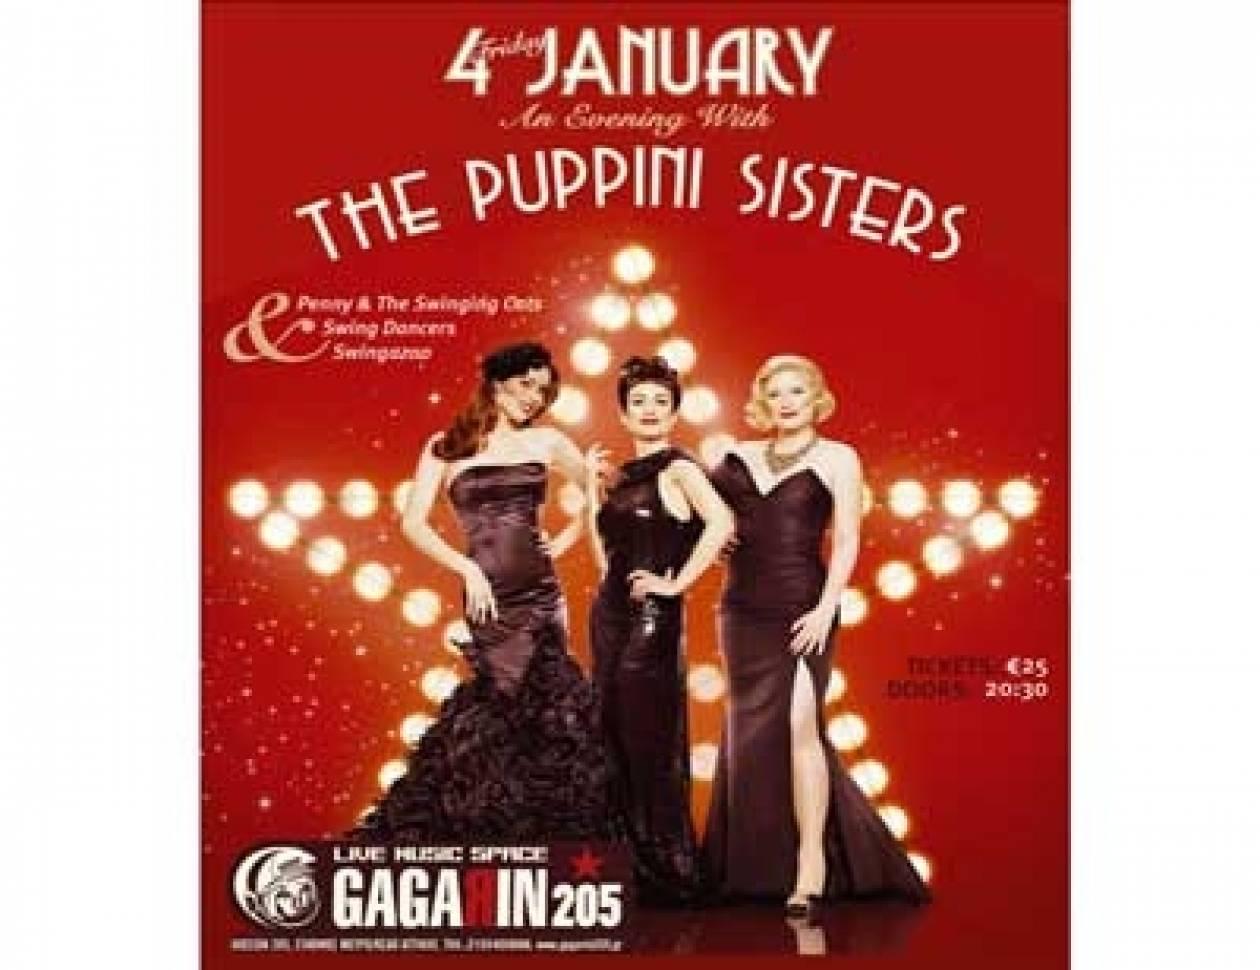 The Puppini Sisters live στο Gagarin205